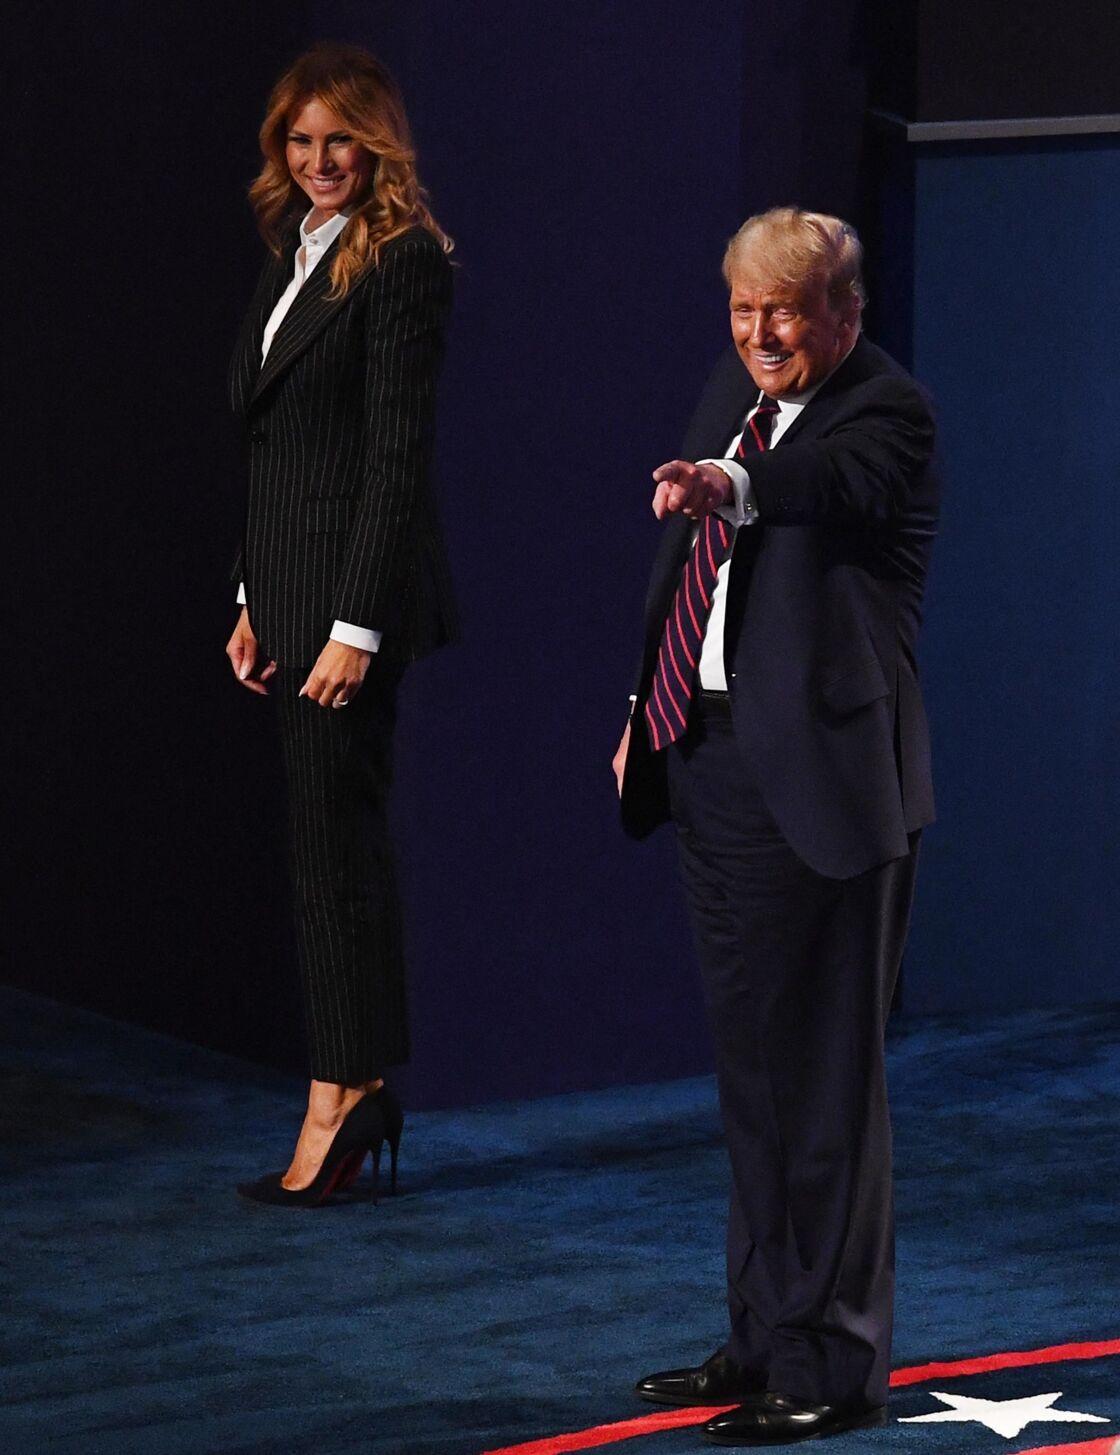 Donald et Melania Trump lors du débat